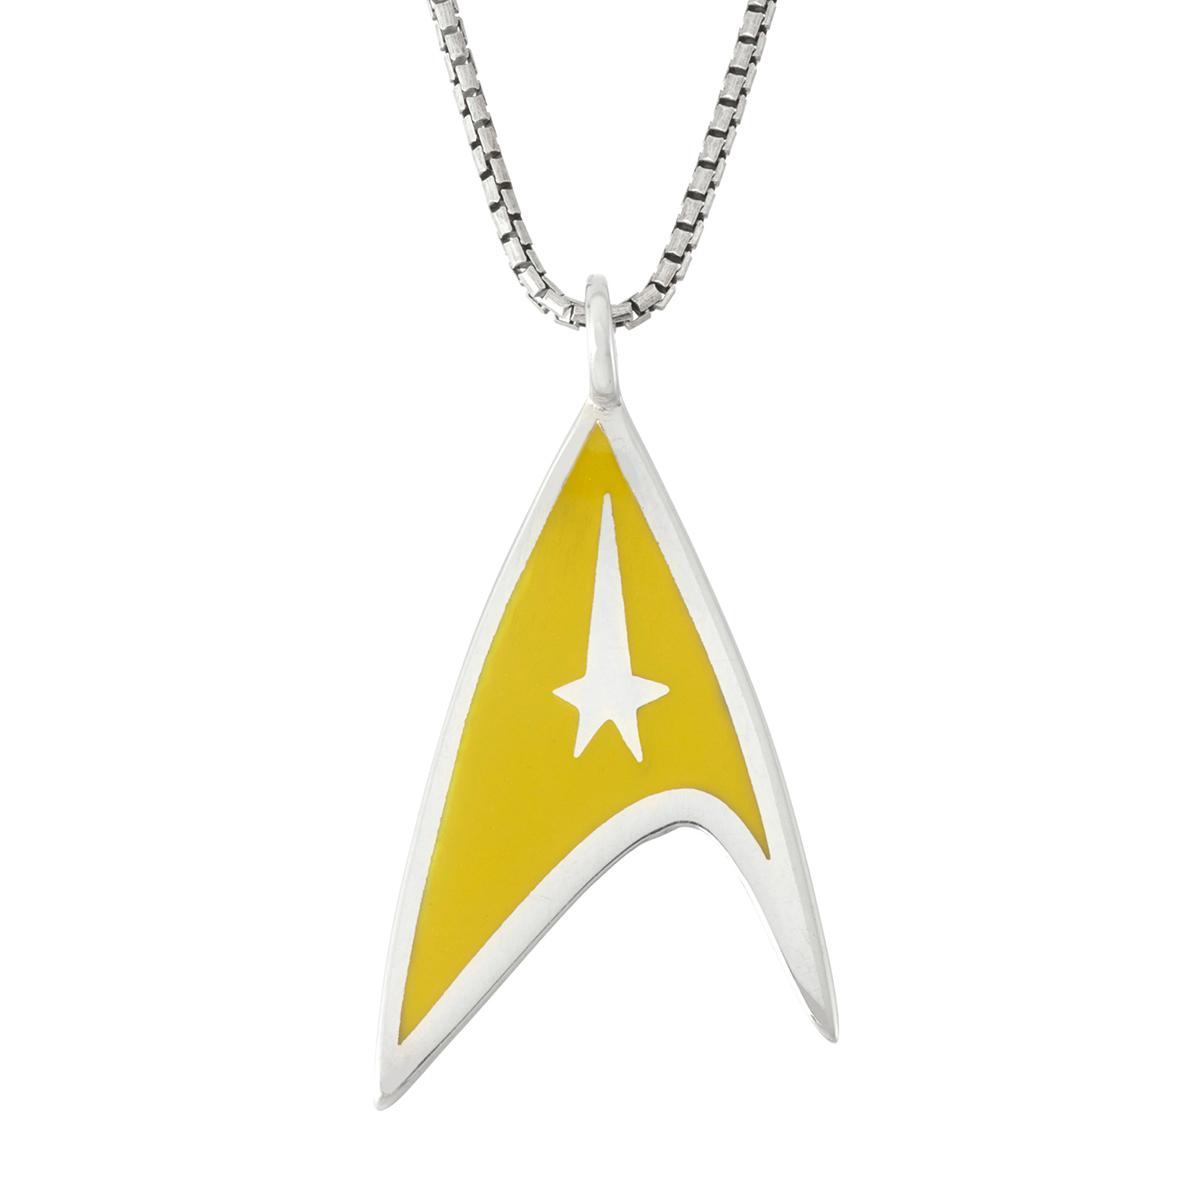 Star Trek TNG Mirror Saga, Through the Mirror, Out in May